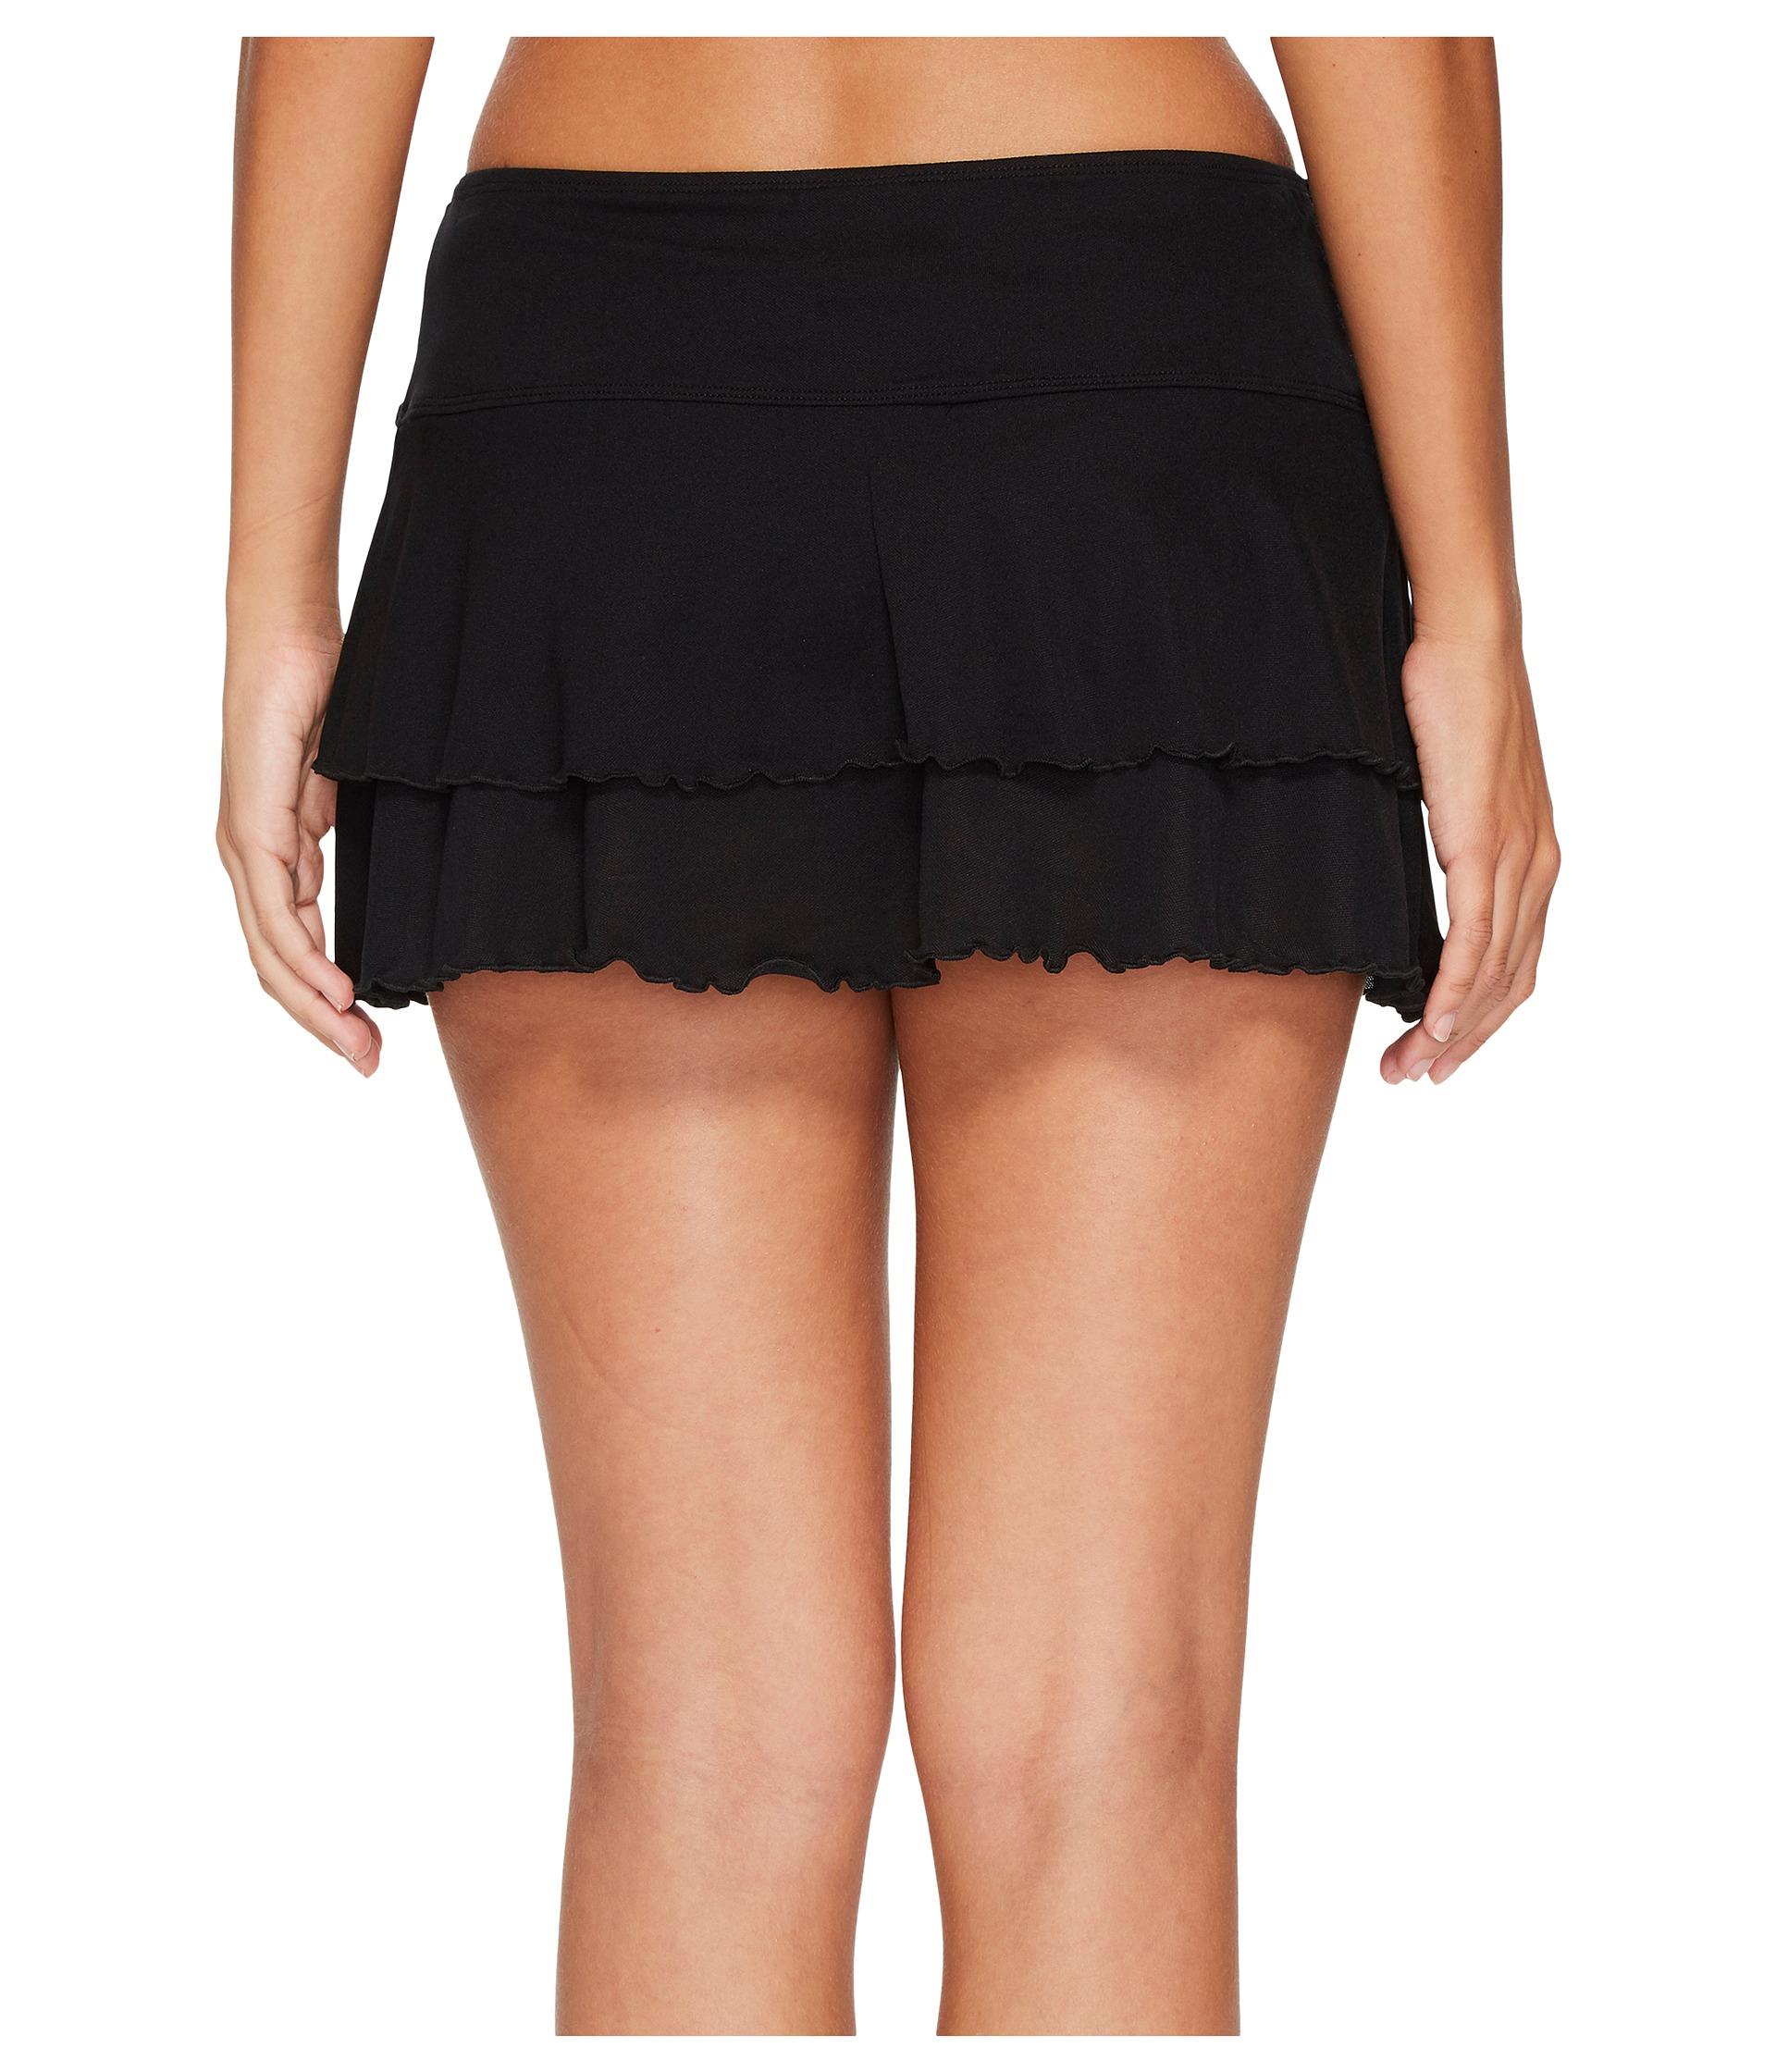 Body Glove Skirt 6